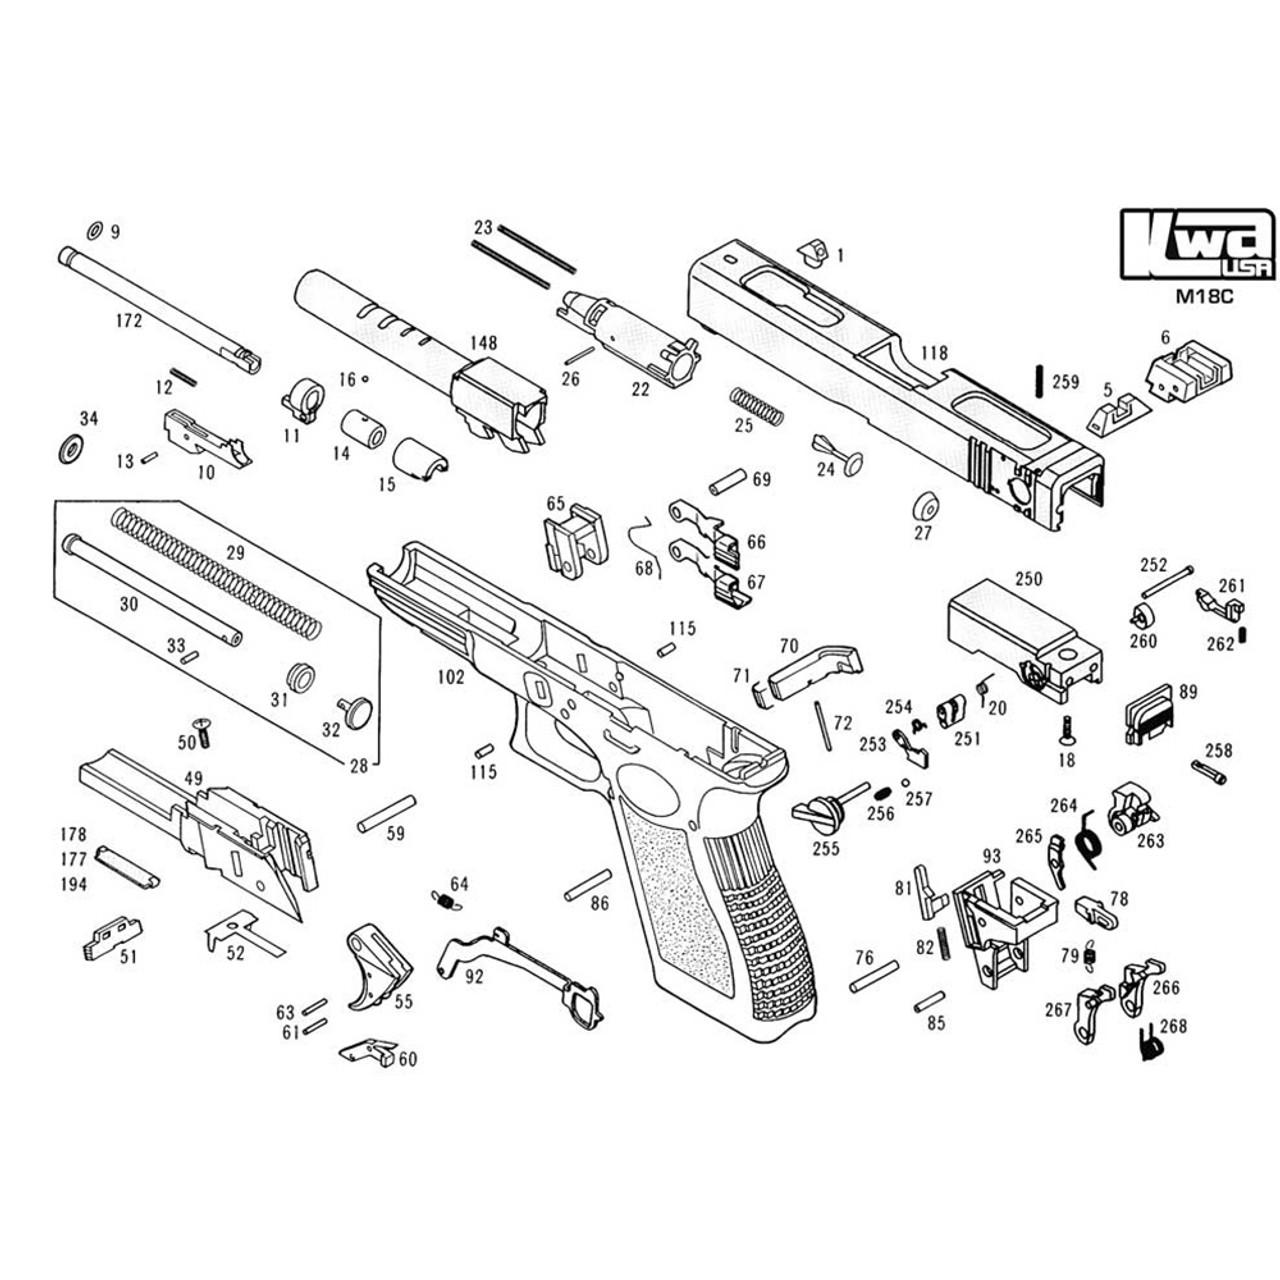 hight resolution of kwa airsoft m18c pistol diagram